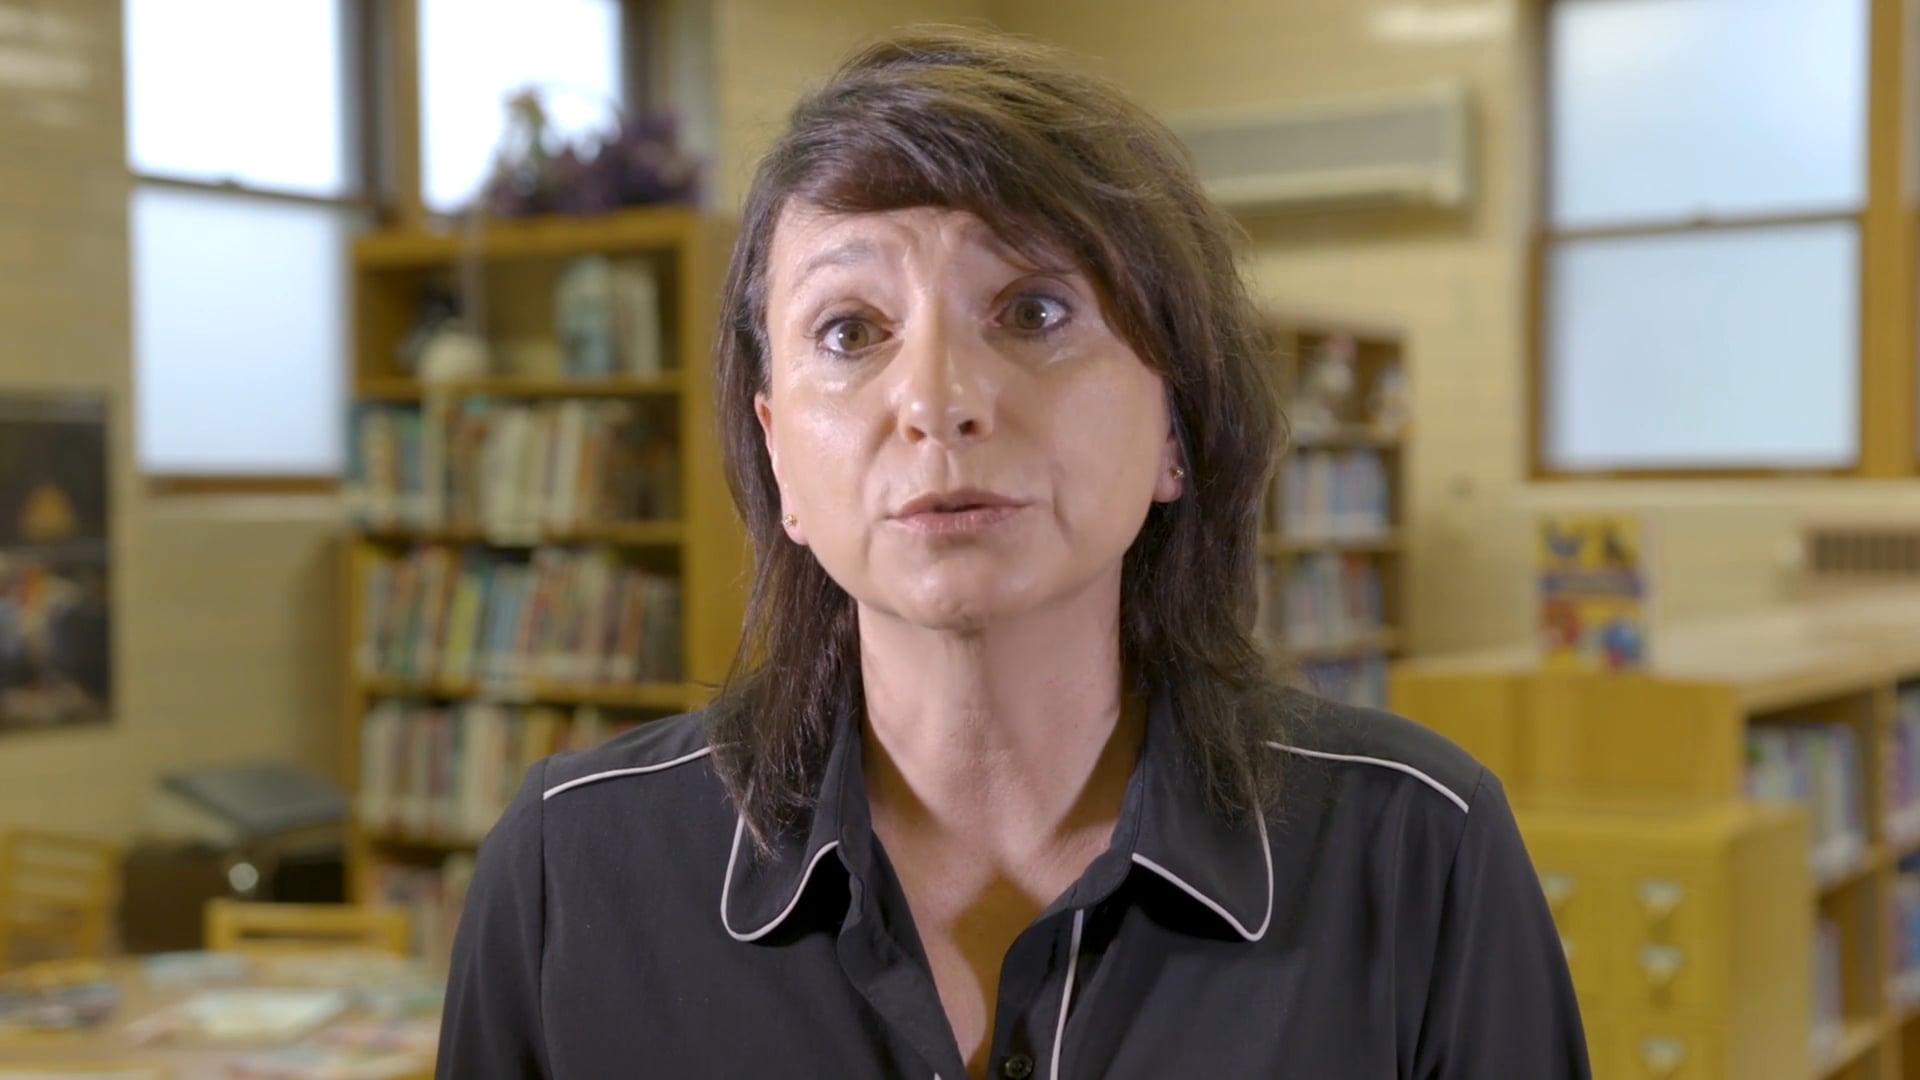 Watch Darlette's Story